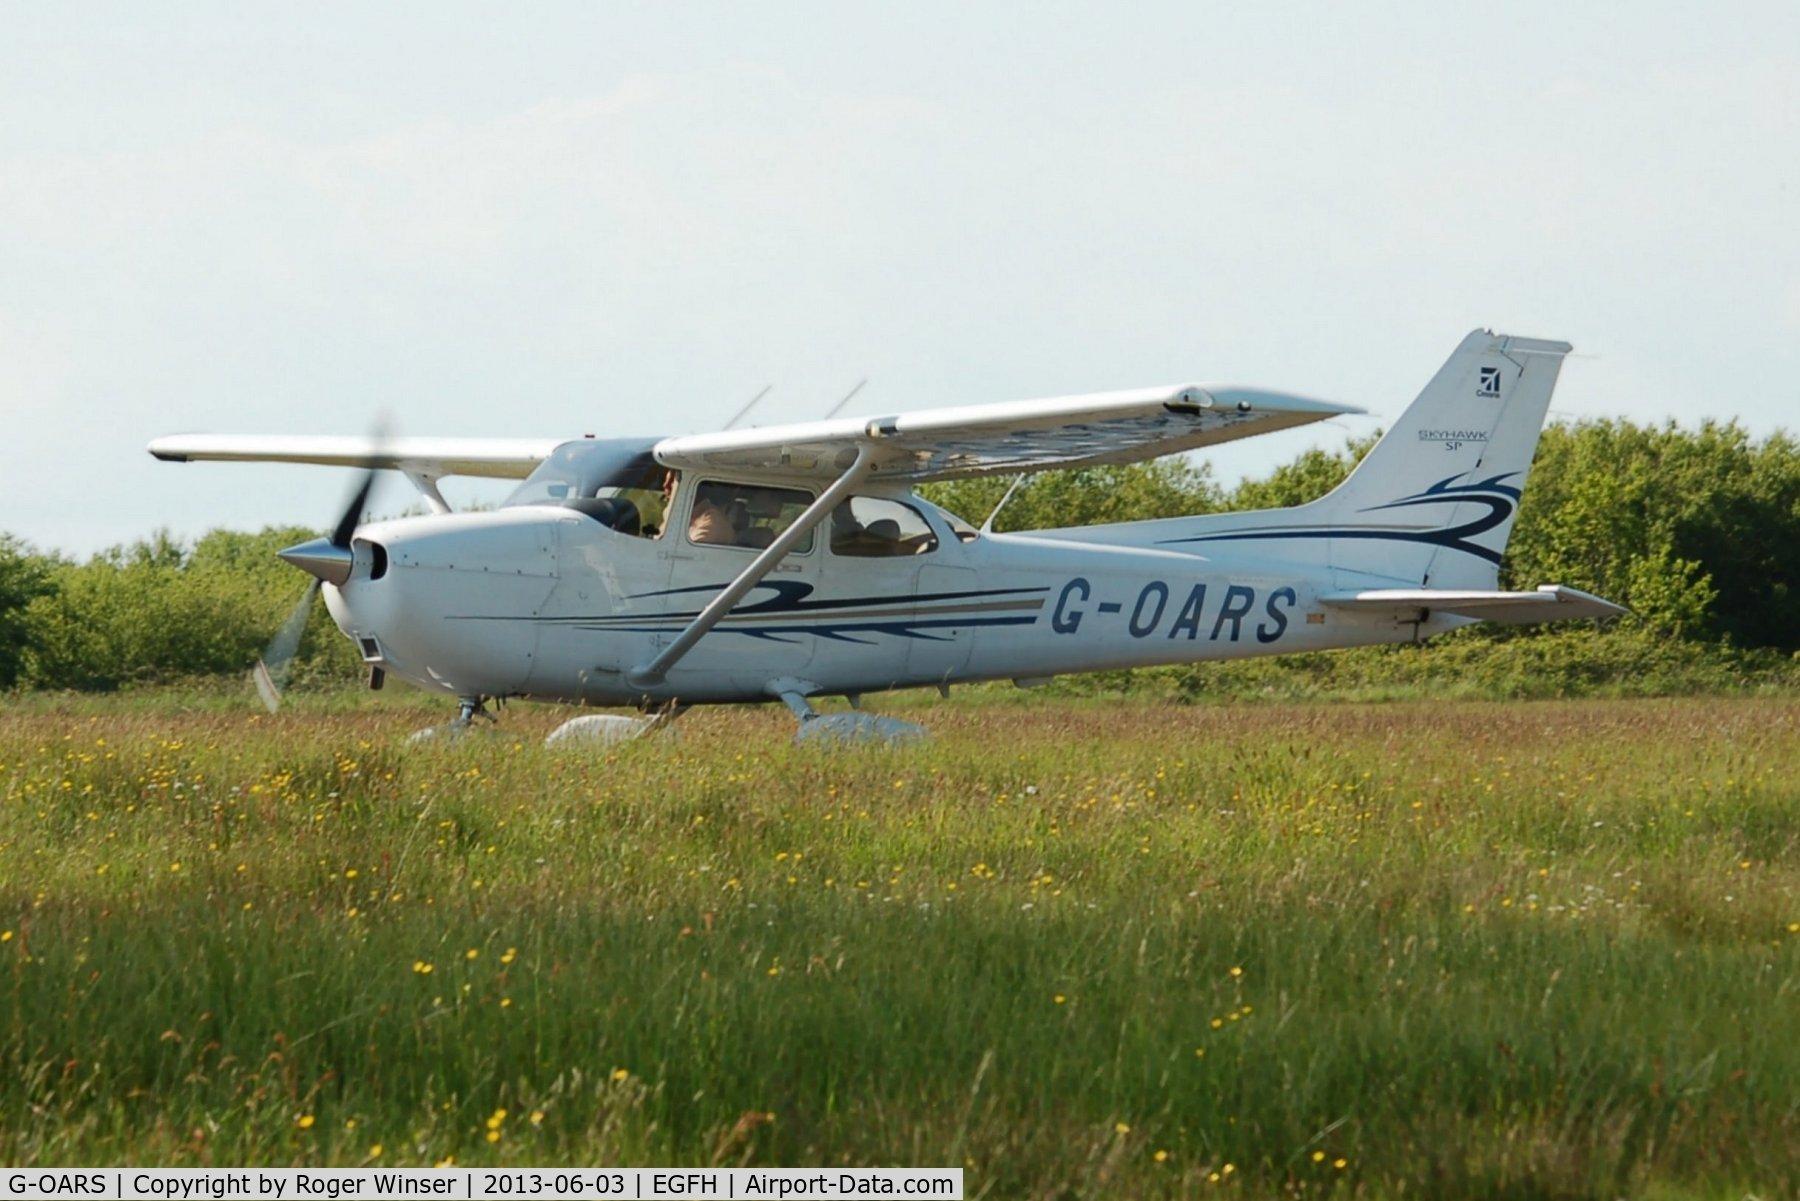 G-OARS, 2010 Cessna 172S Skyhawk C/N 172S11048, Visiting Millenium Skyhawk SP.